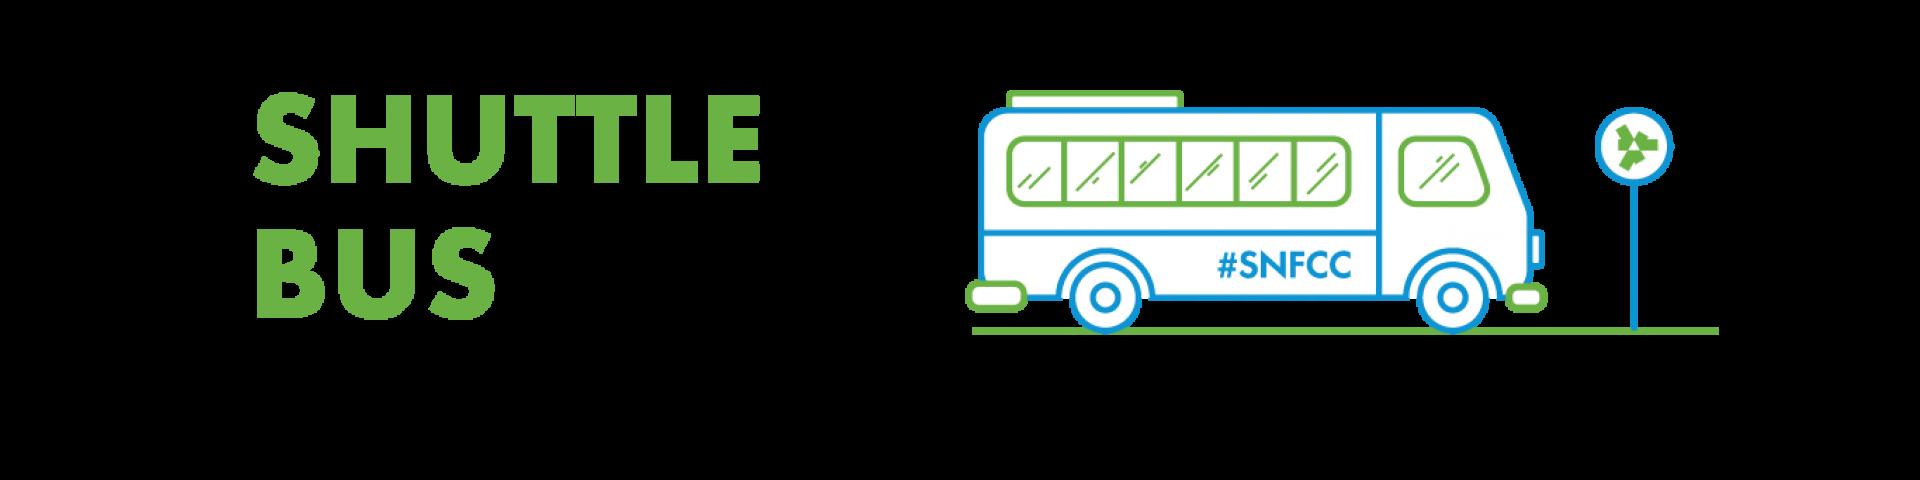 Shuttle Bus - Εικόνα